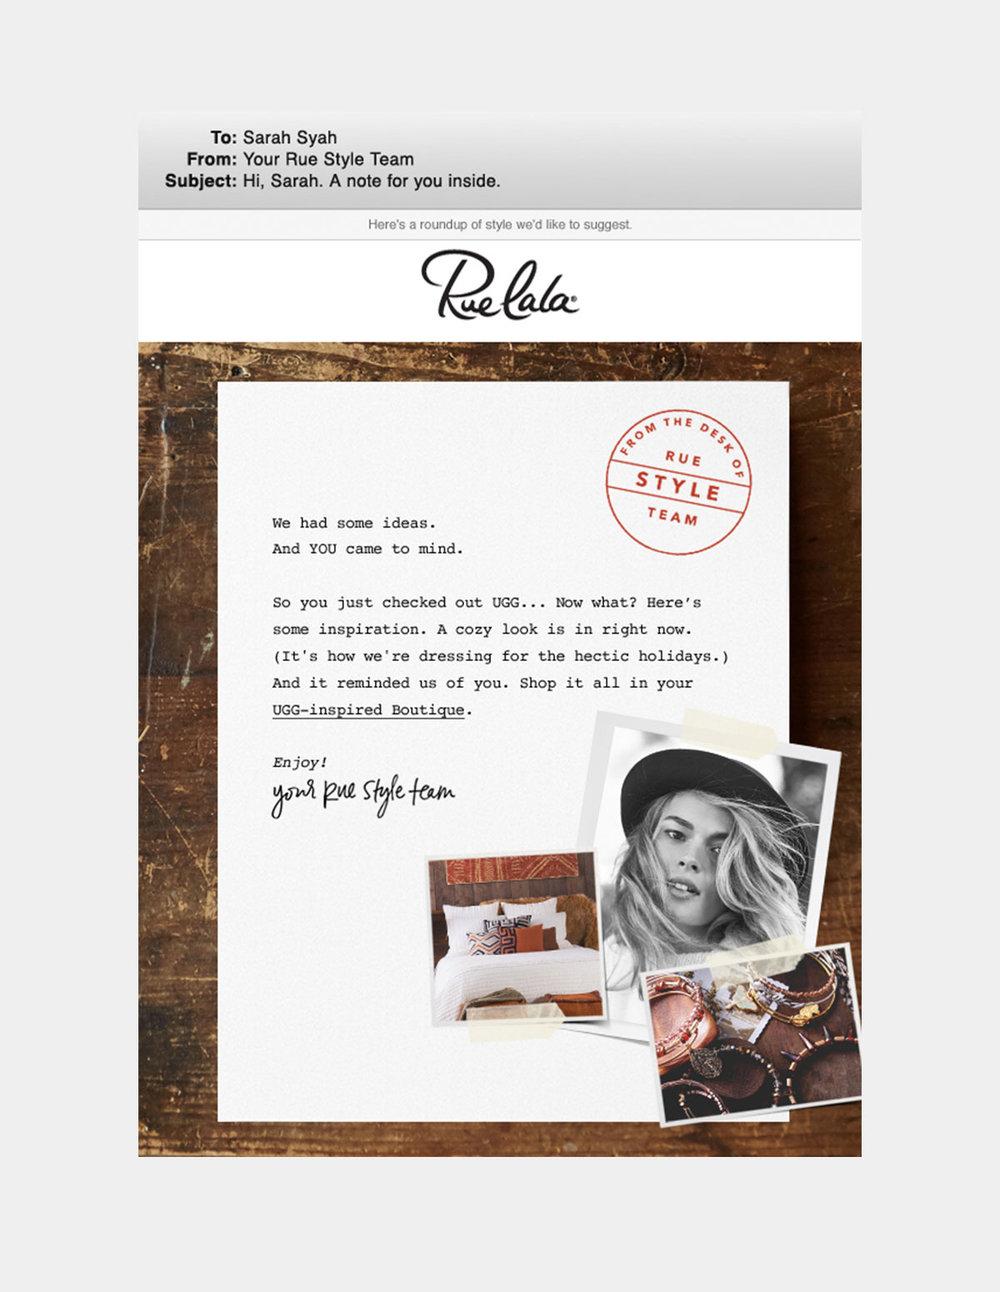 Laura-vanessa-gonzalez-lvg-lvgdesign-lvgworks-art-direction-director-artist-graphic-design-designer-photography-photographer-fashion-editorial-tabletop-set-boston-freelance-type-typeography-email-marketing-2.jpg